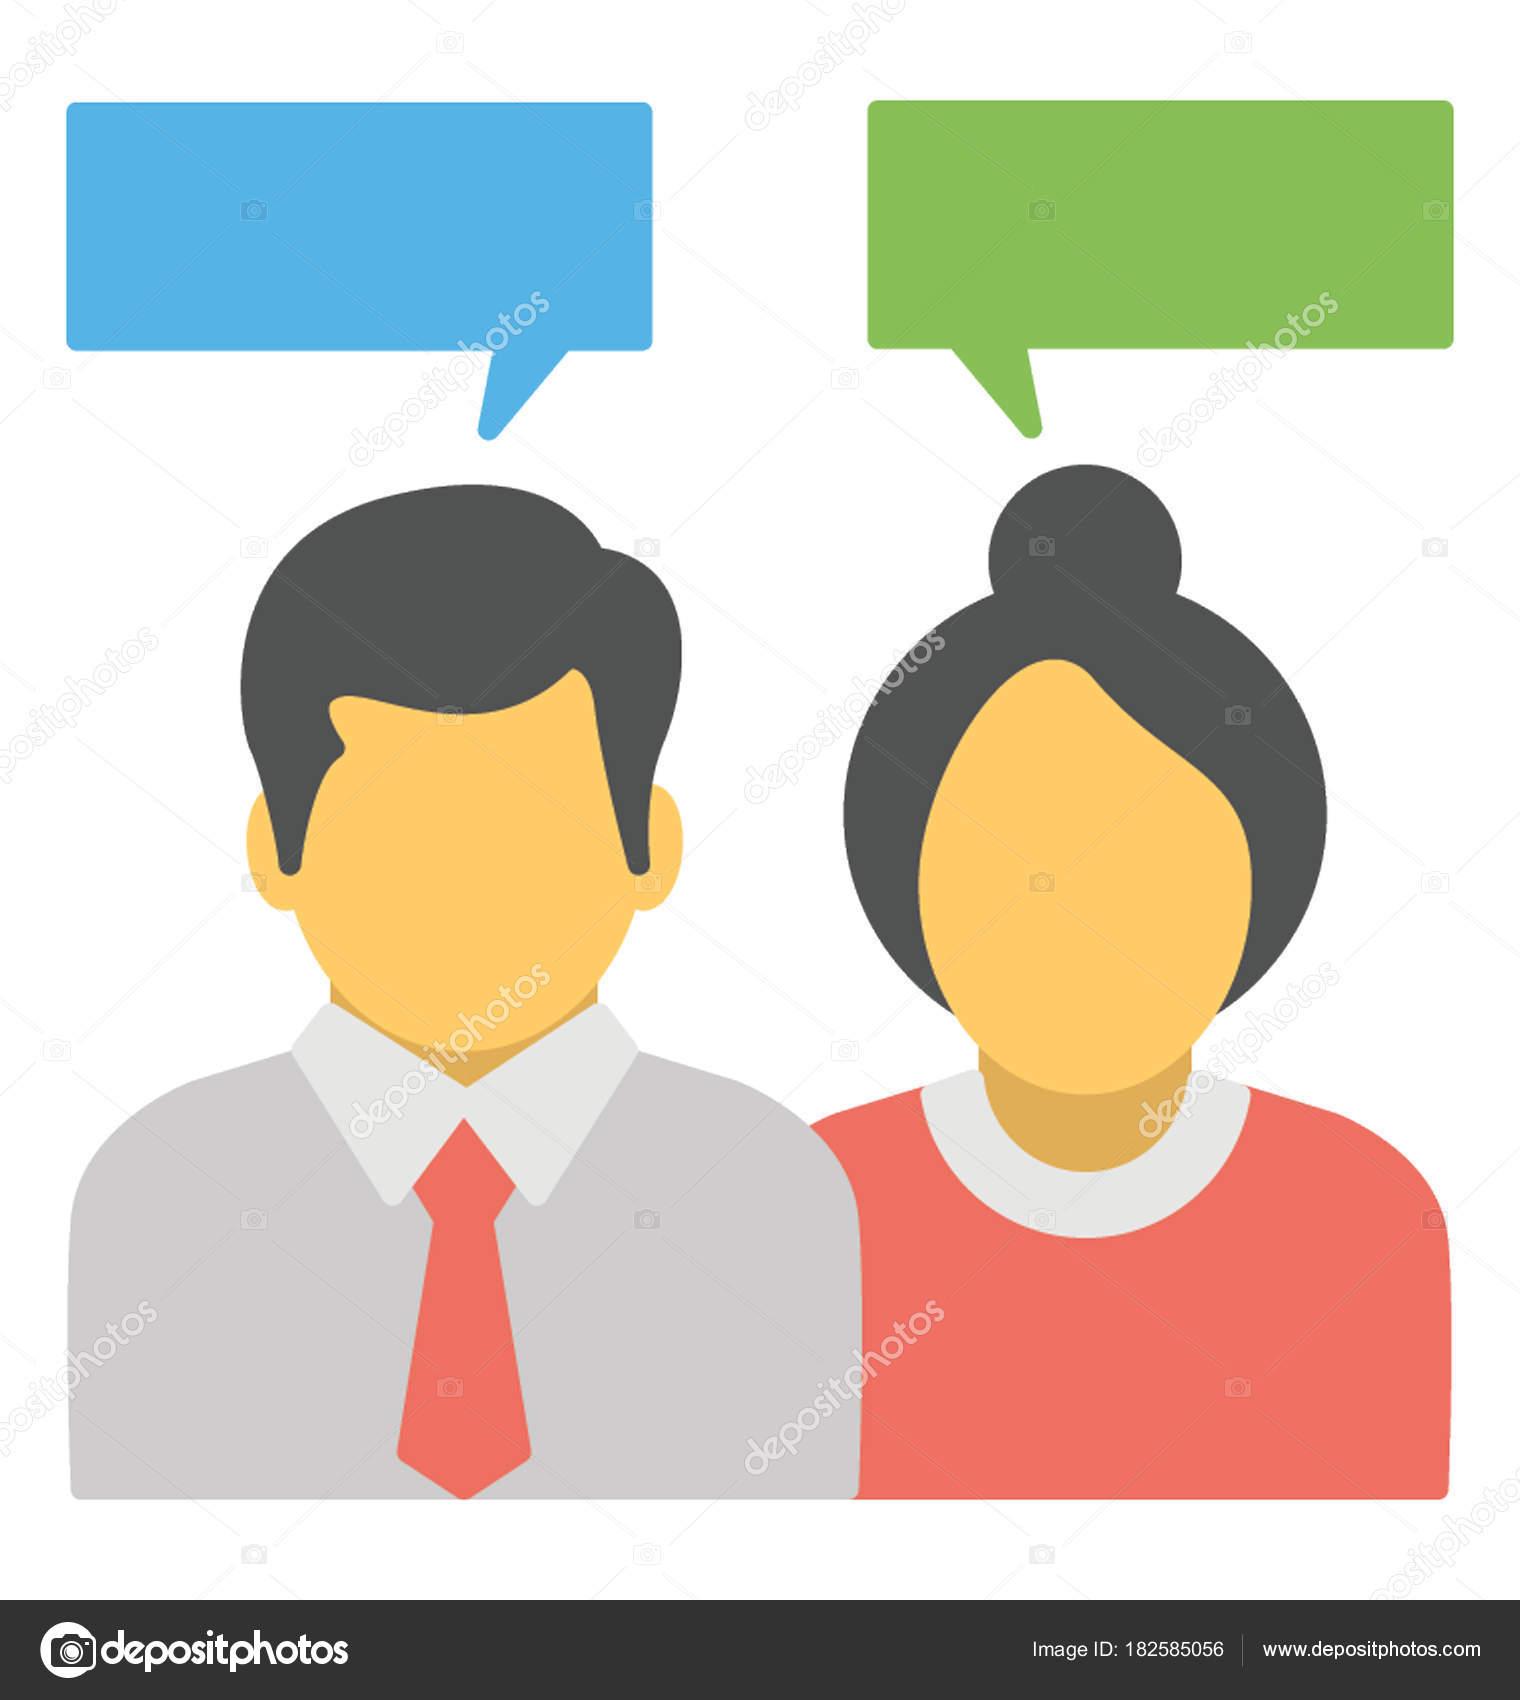 man woman avatars chat bubbles concept chat discussion communication